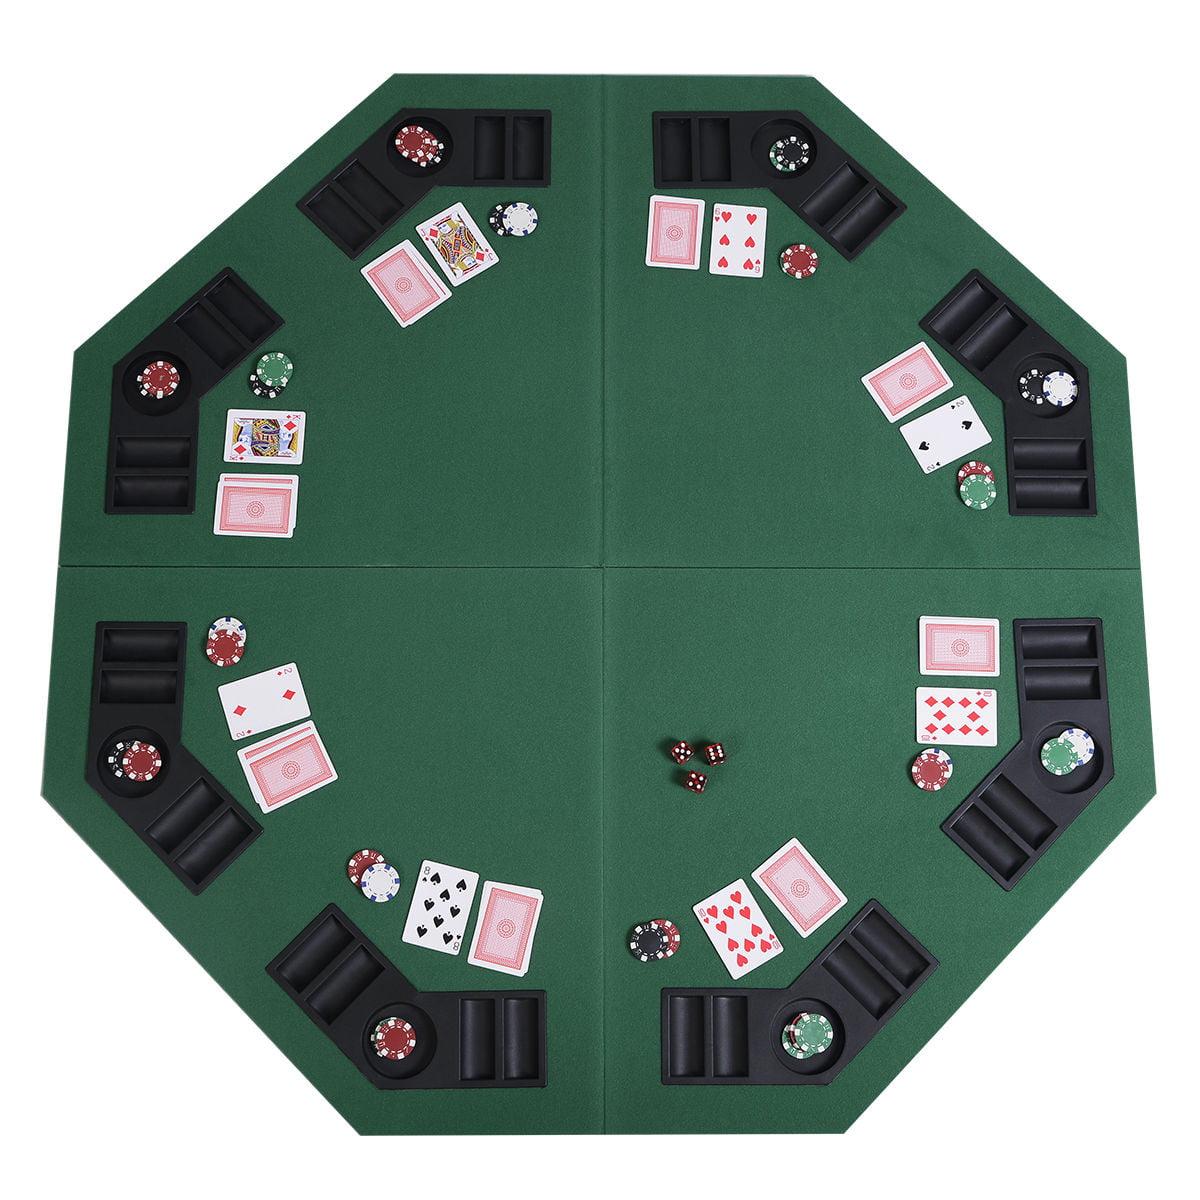 Seats 8 BRAND NEW Folding Poker Table Top